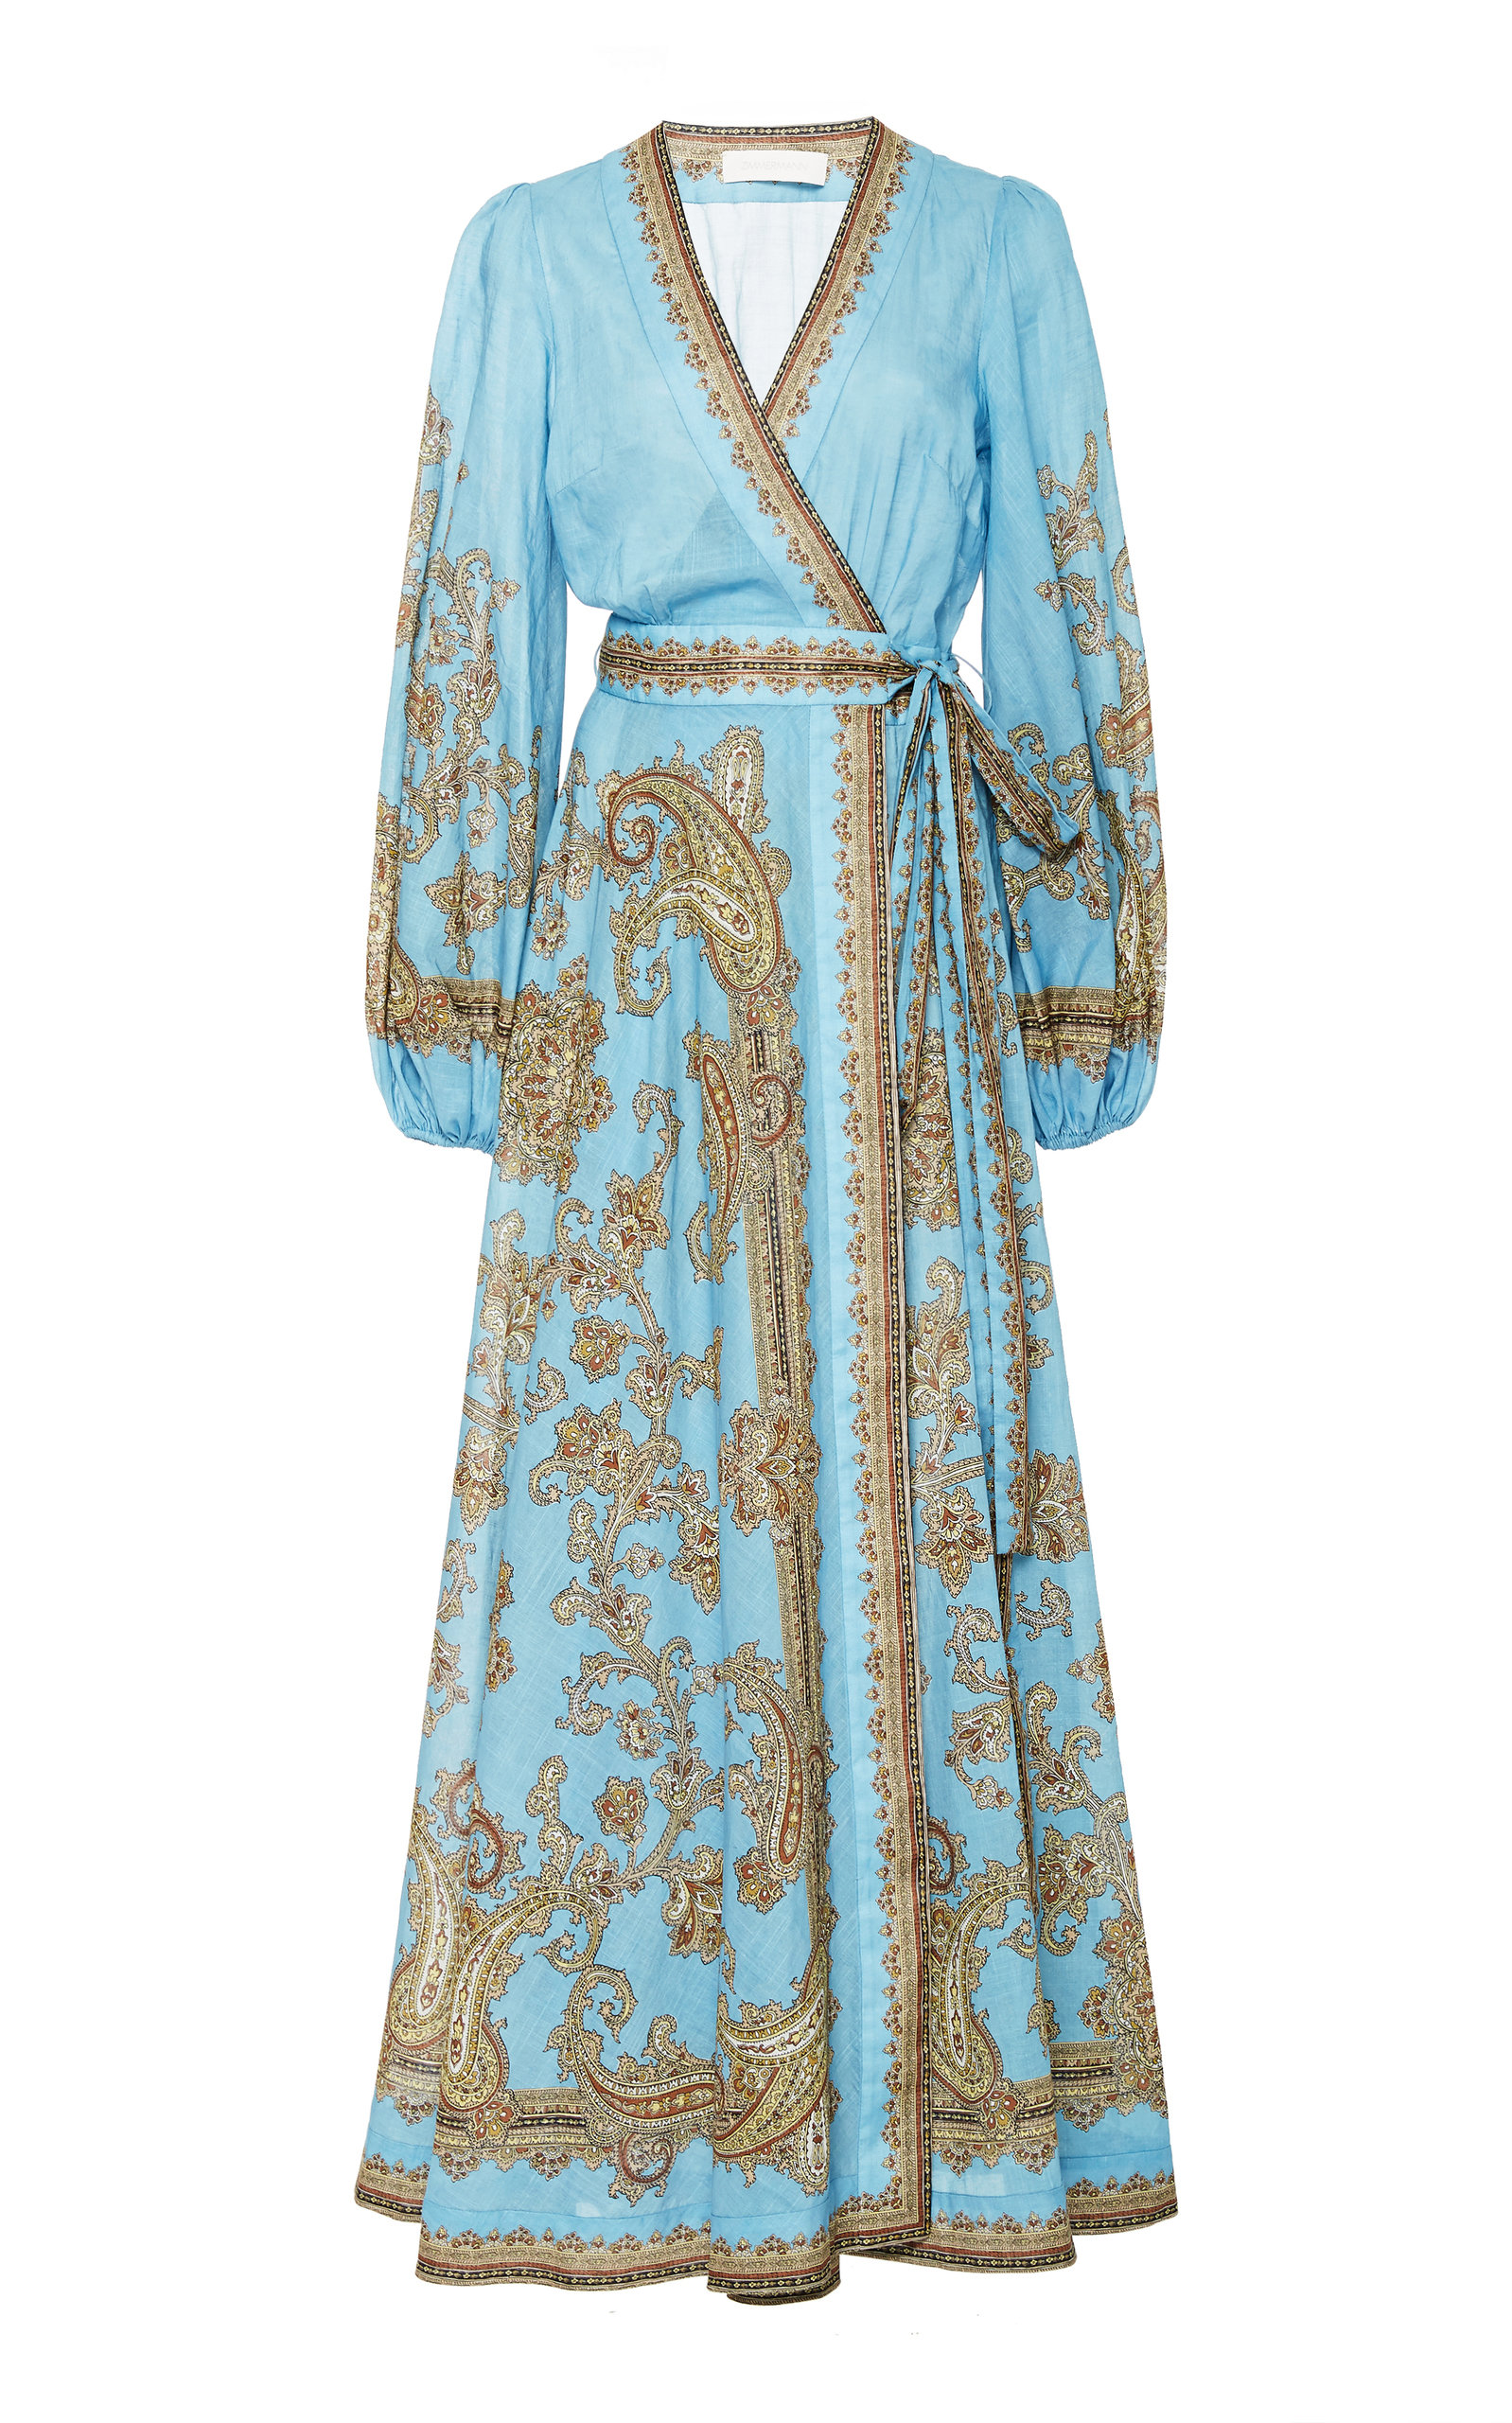 Buy Zimmermann Fiesta Printed Cotton Maxi Wrap Dress online, shop Zimmermann at the best price